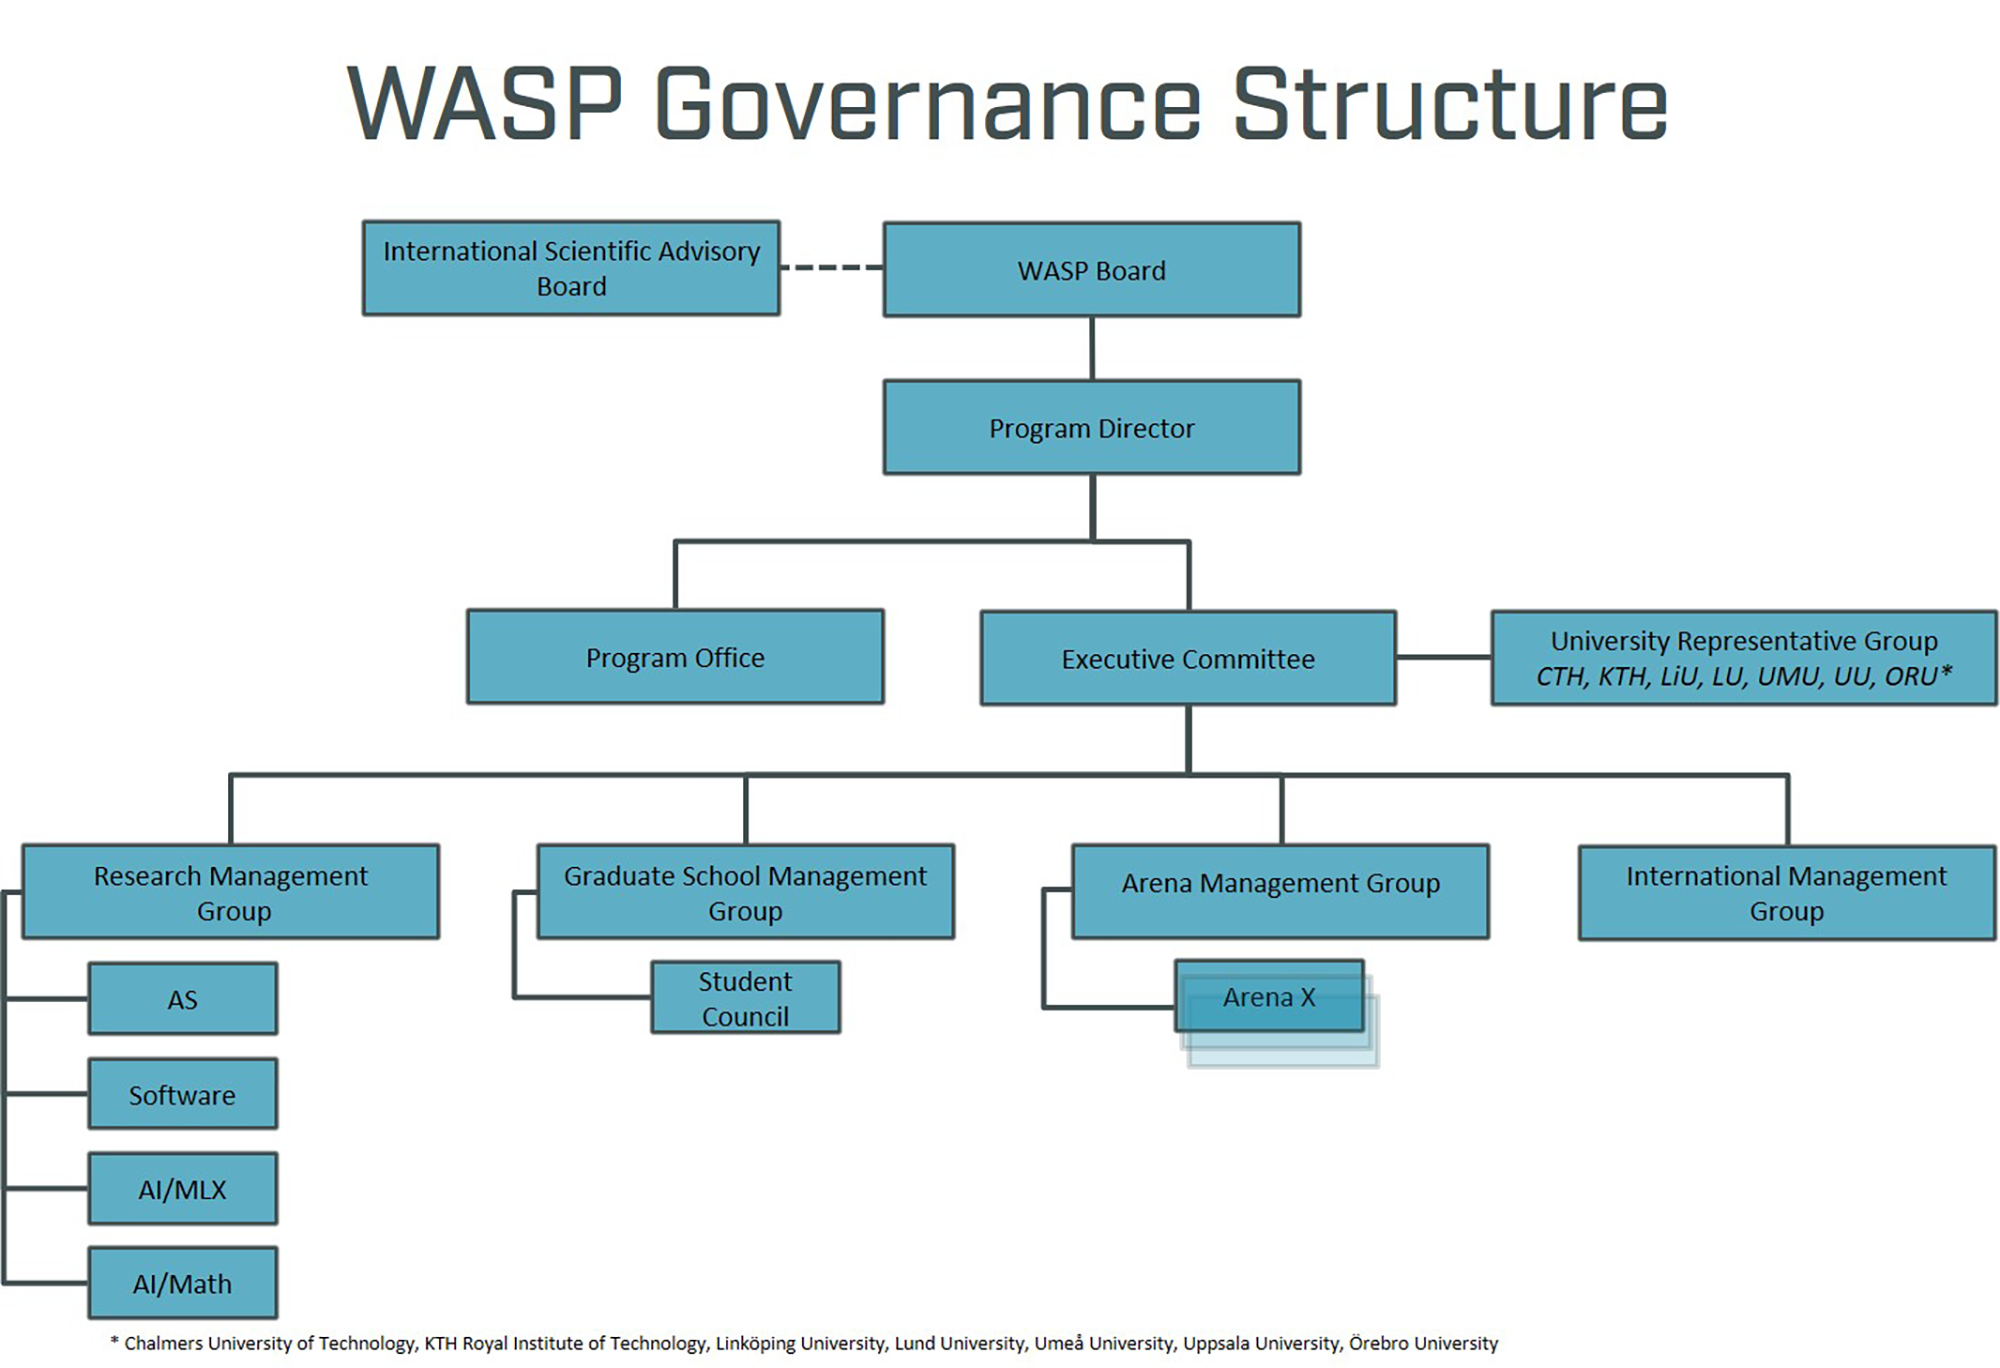 Illustration of WASP governance structure